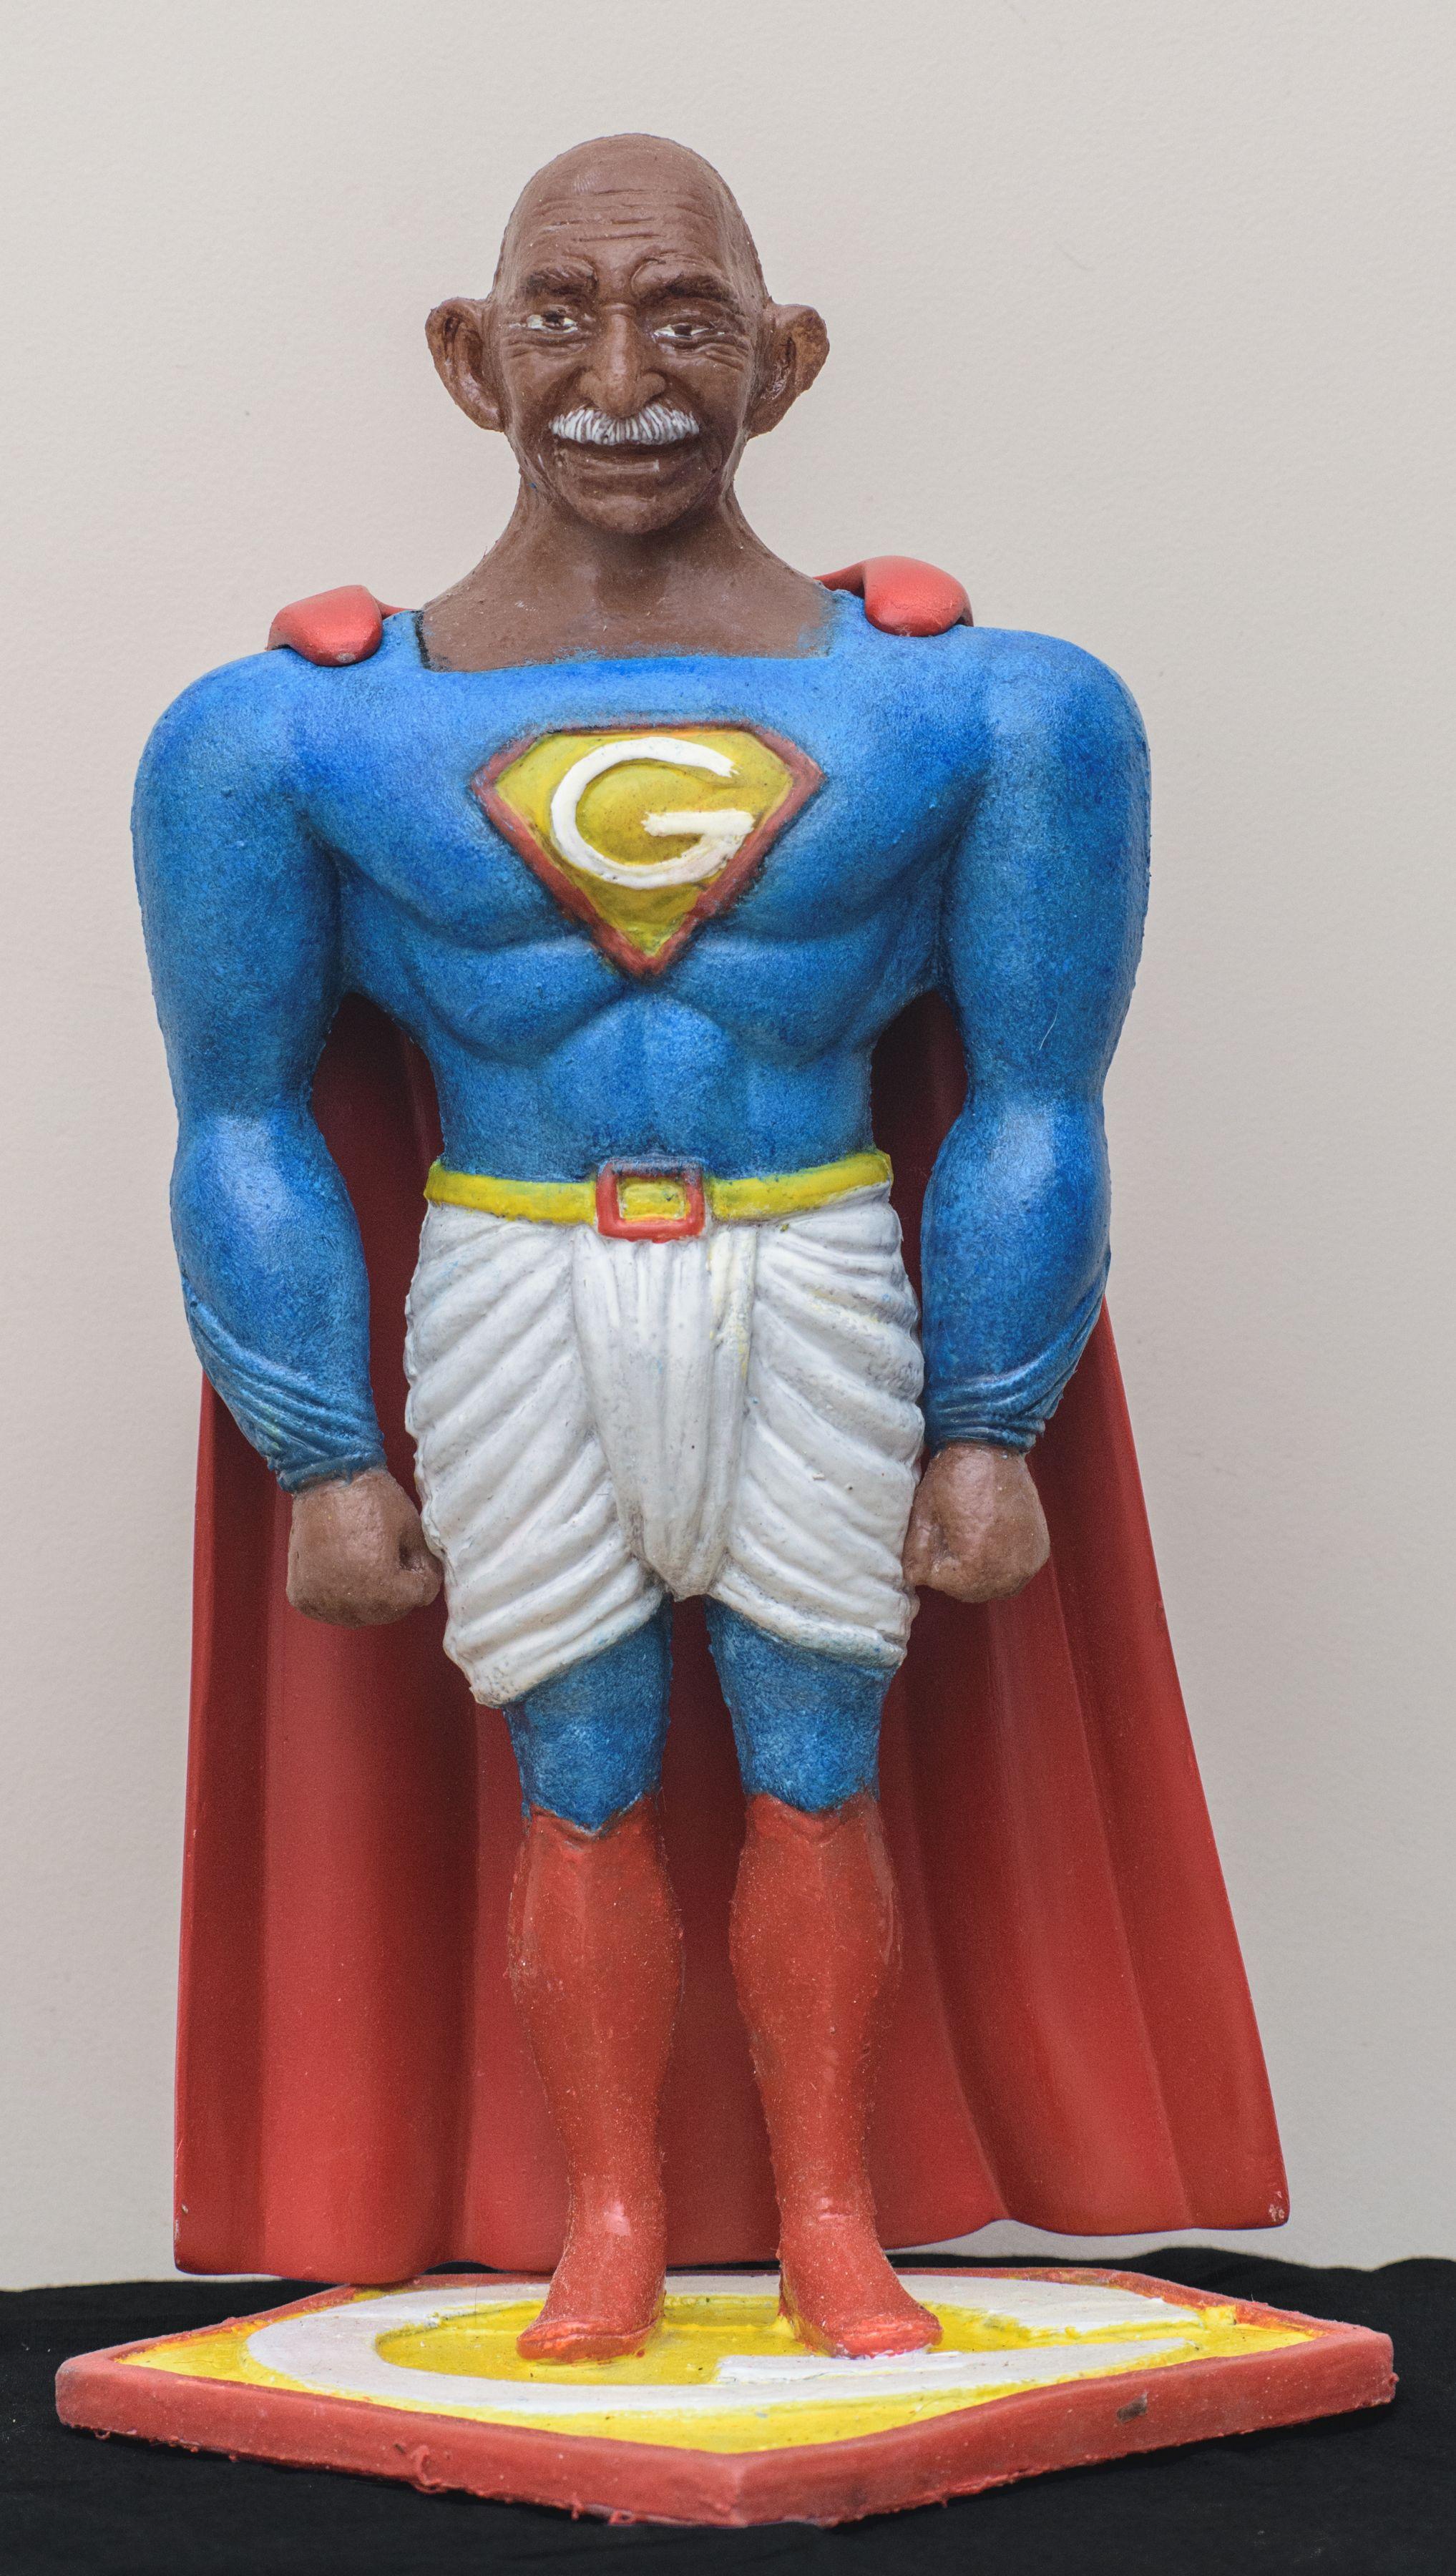 Toy Gandhi 4 (Small Superhero)